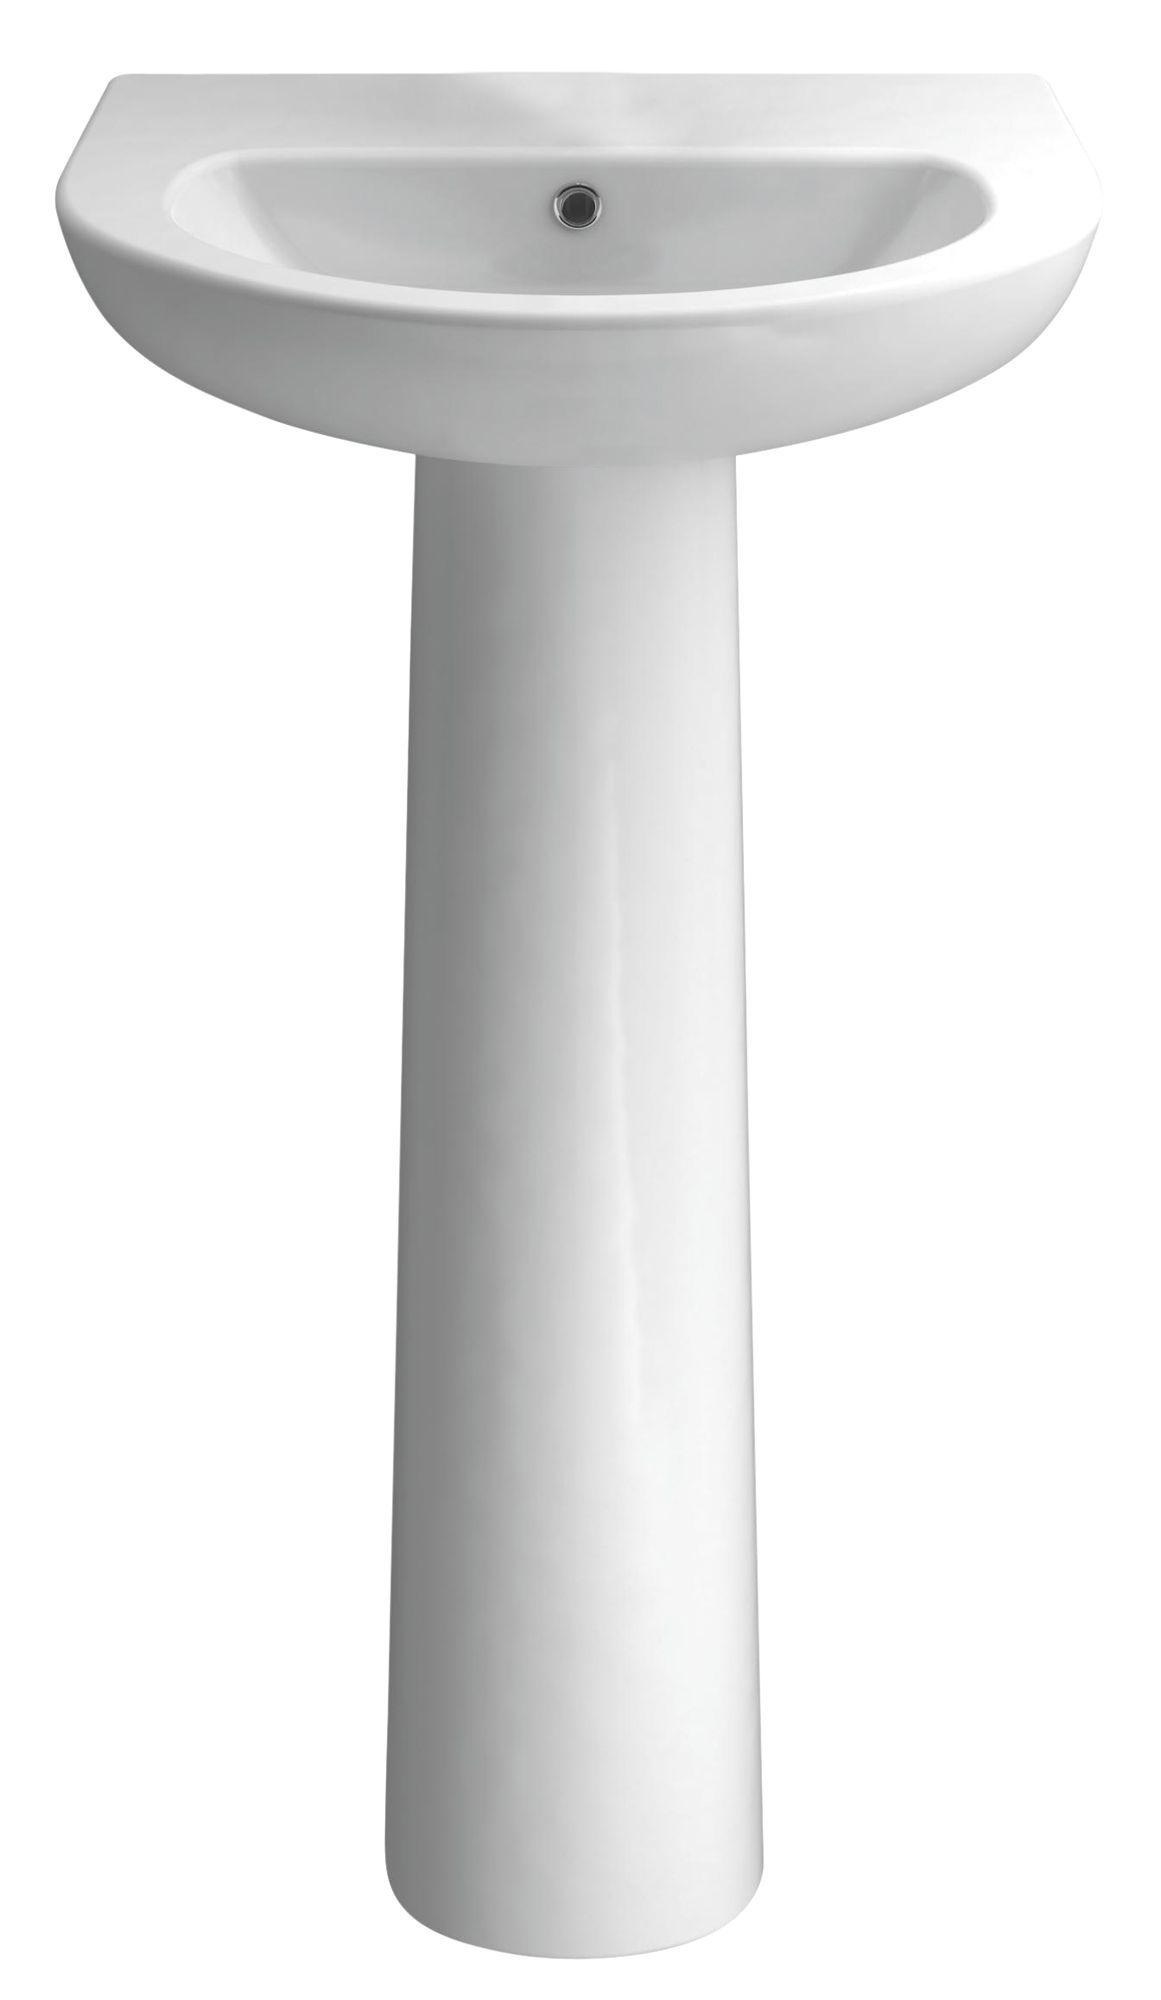 Bathroom Sinks B&Q Ireland cooke & lewis perdita full pedestal basin | departments | diy at b&q